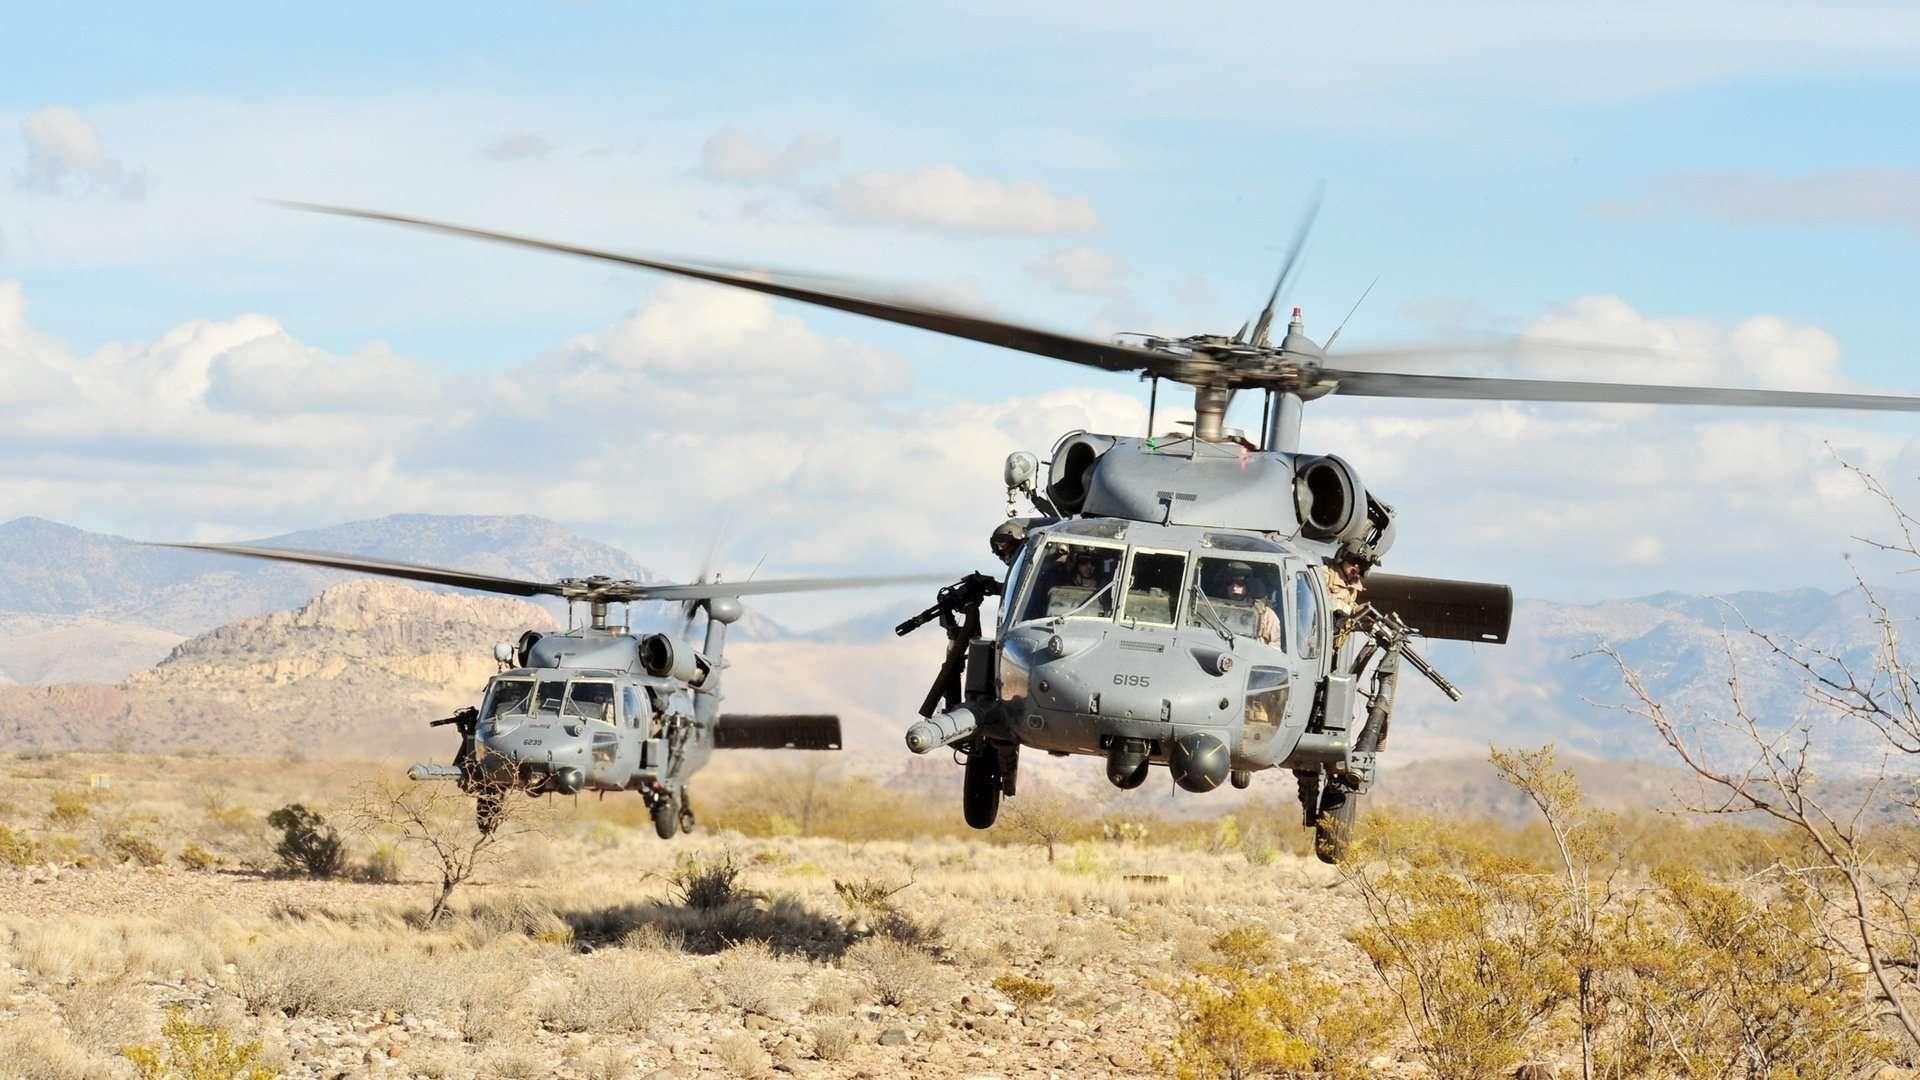 Blackhawk Helicopter Wallpaper 1080p